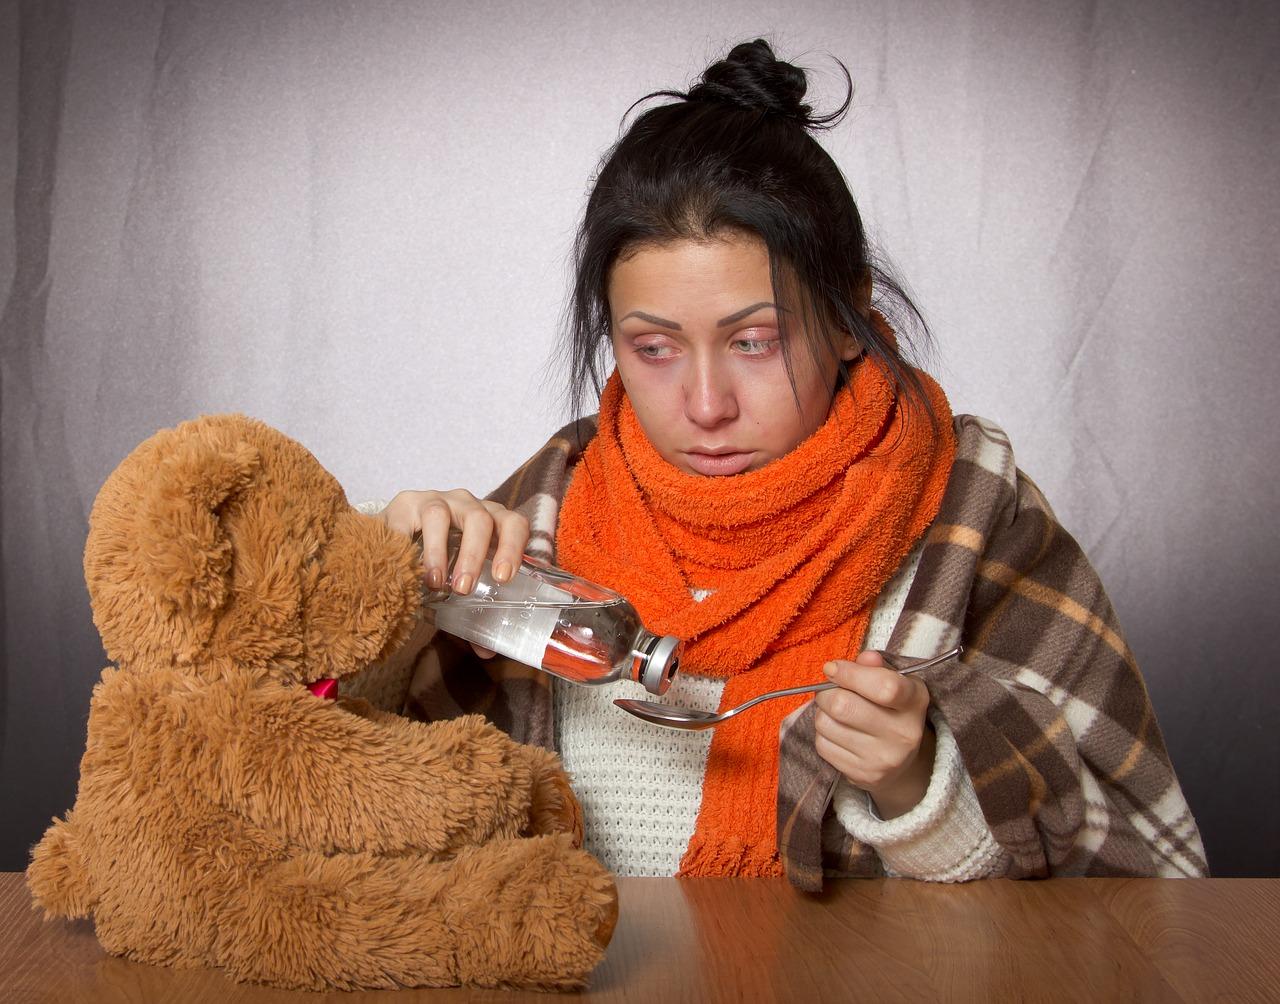 New Surveys Show Less Flu Shots, Less Flu